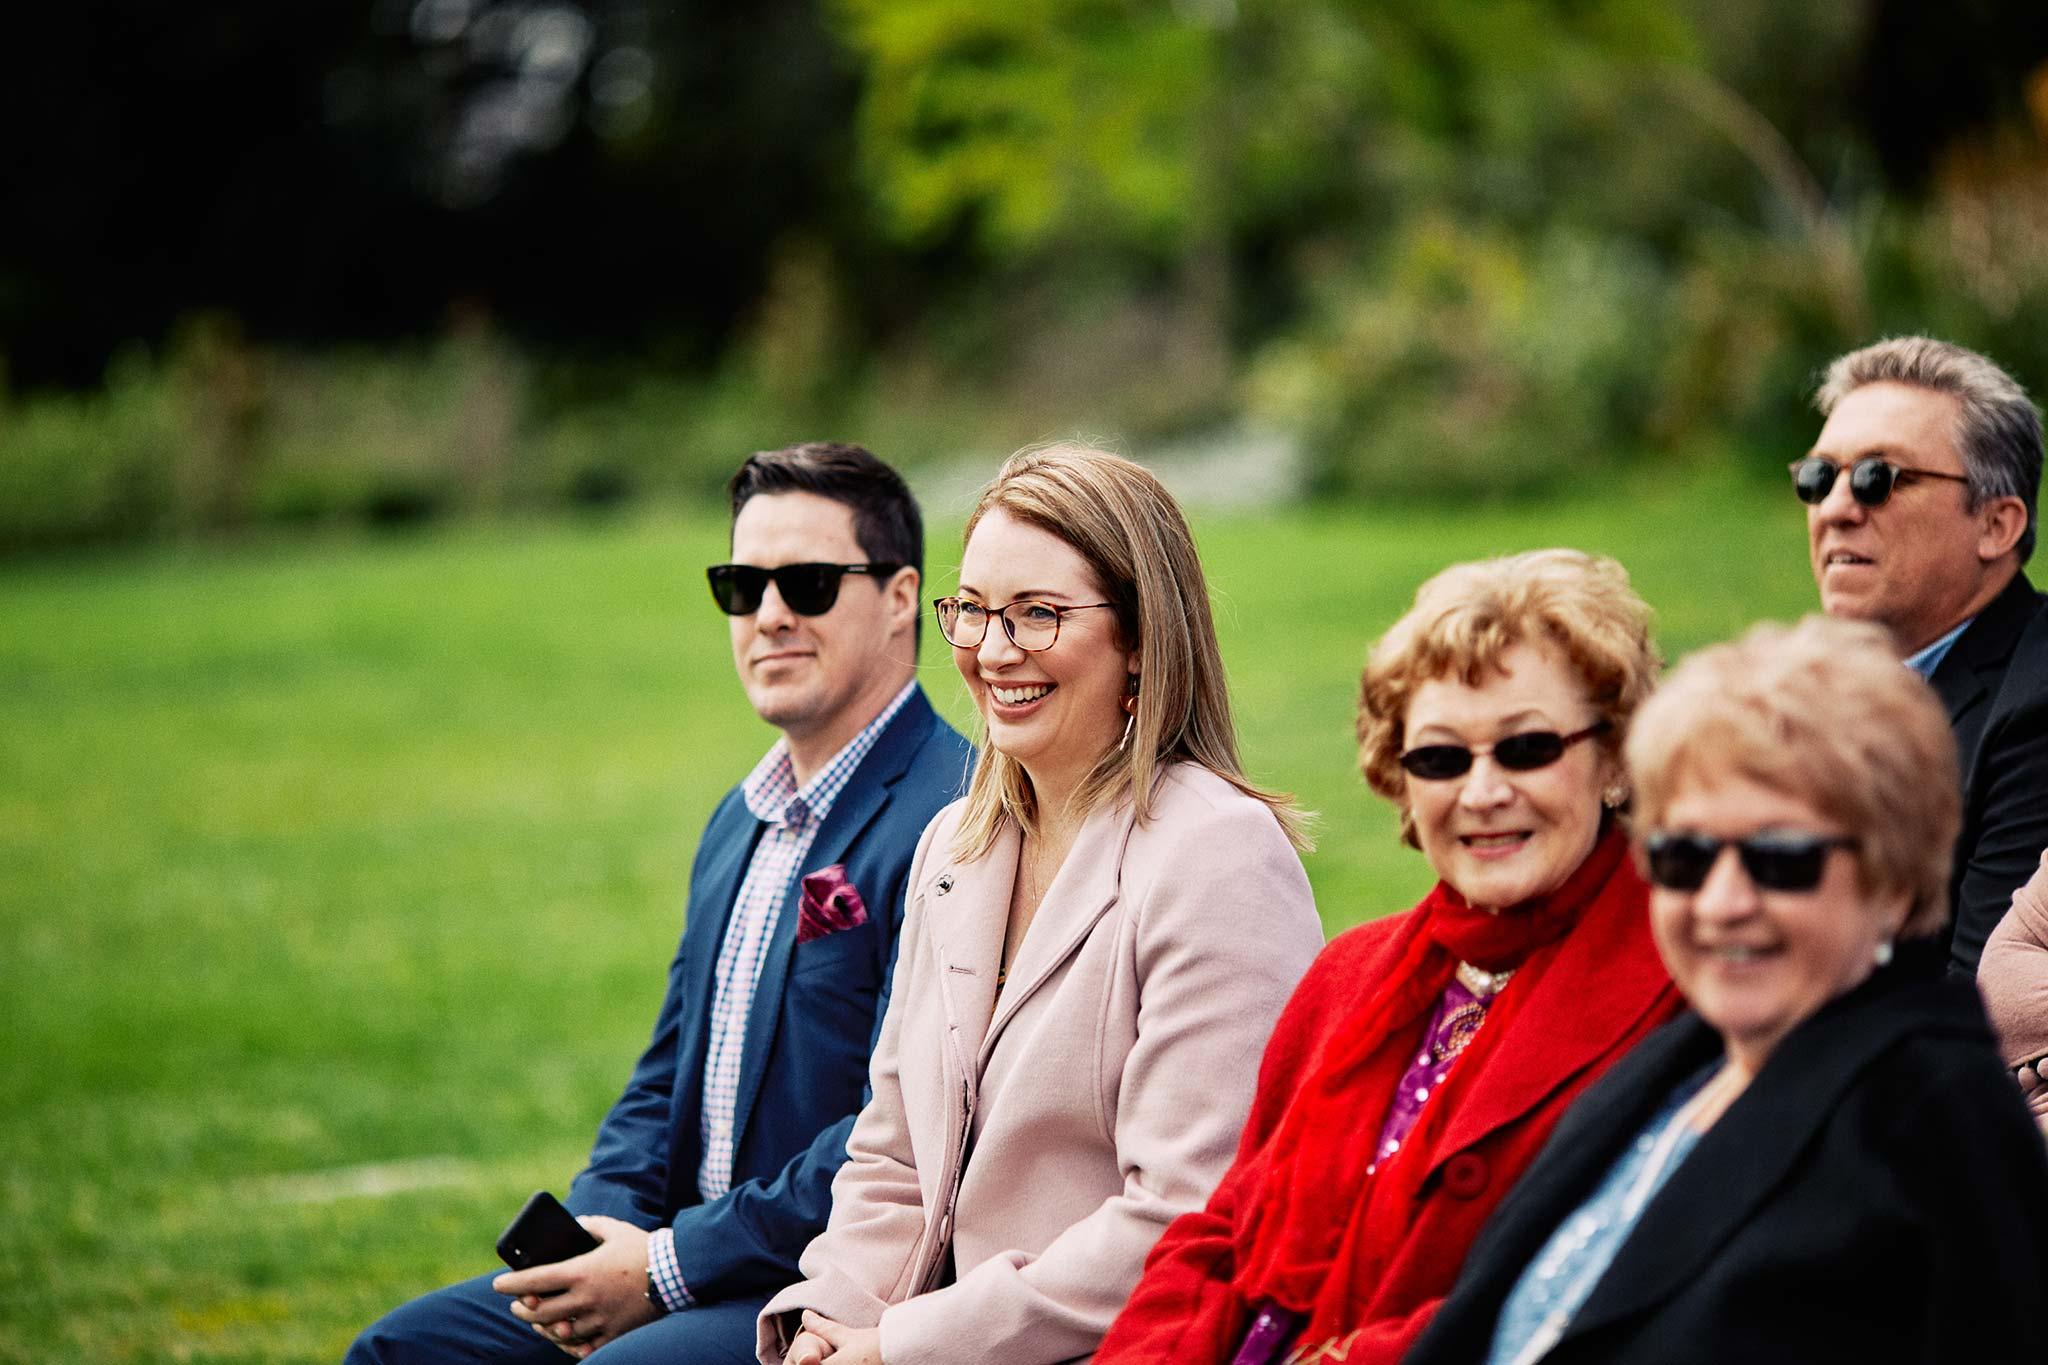 Melbourne Royal Botanical Garden Wedding Ceremony guests reaction